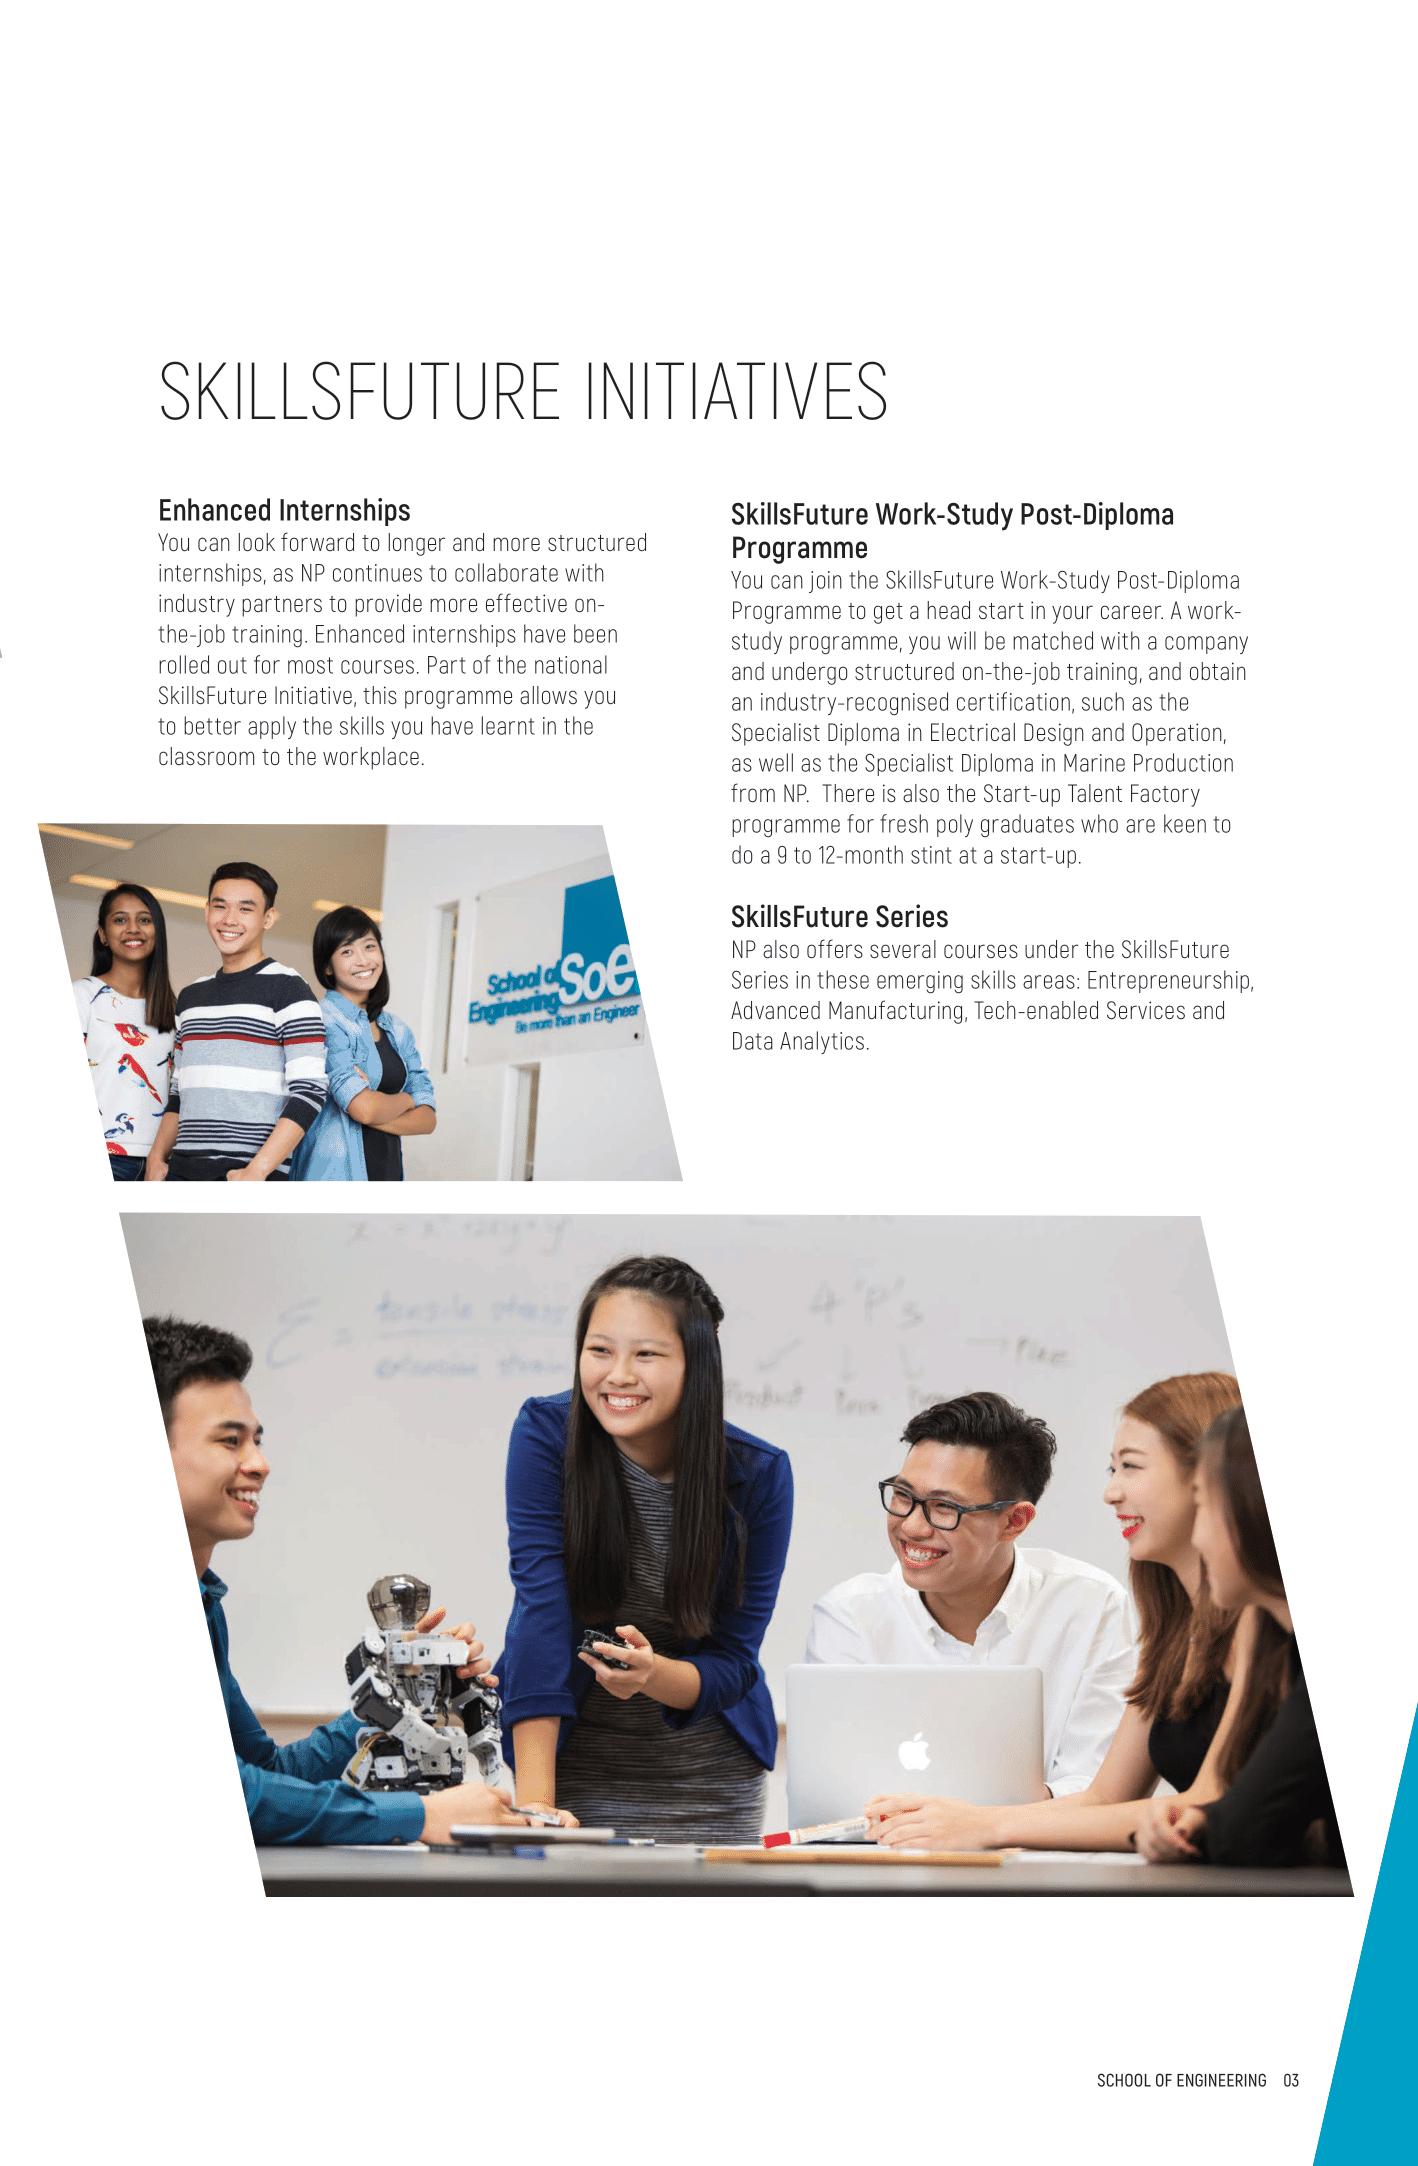 School of Engineering 2020-05